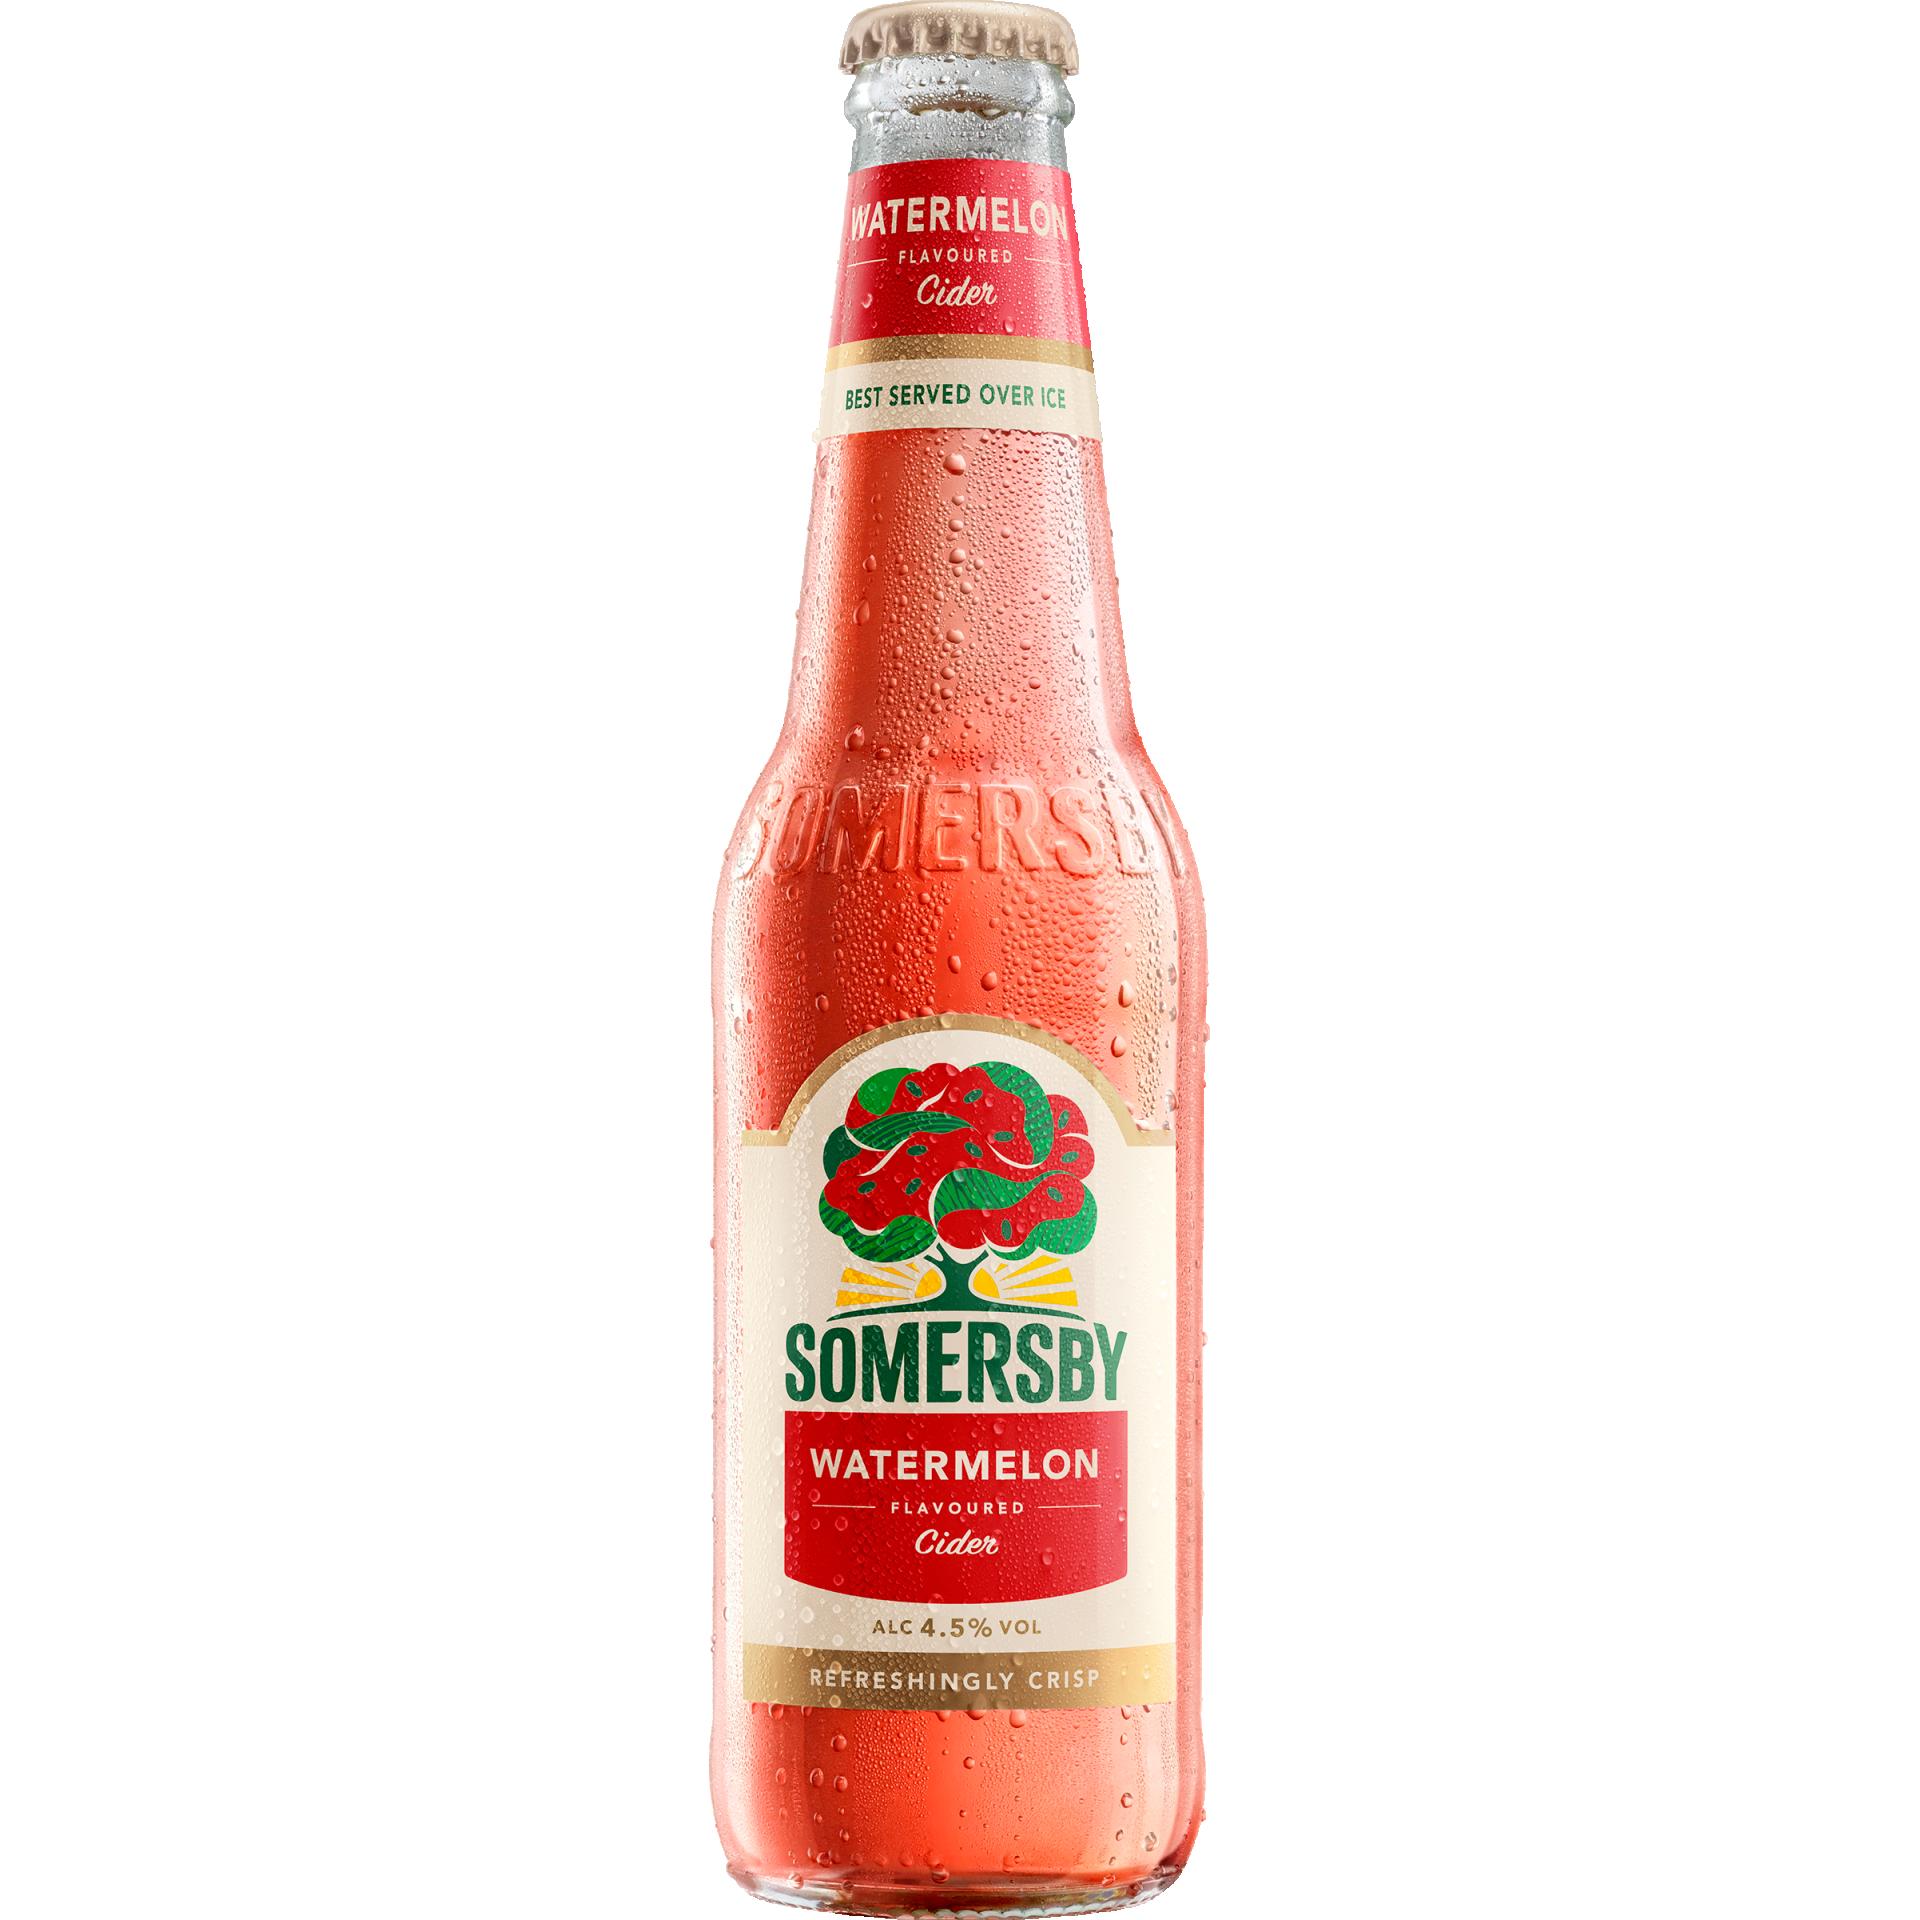 Somersby Watermelon x Tokinomo POS Advertising Robots